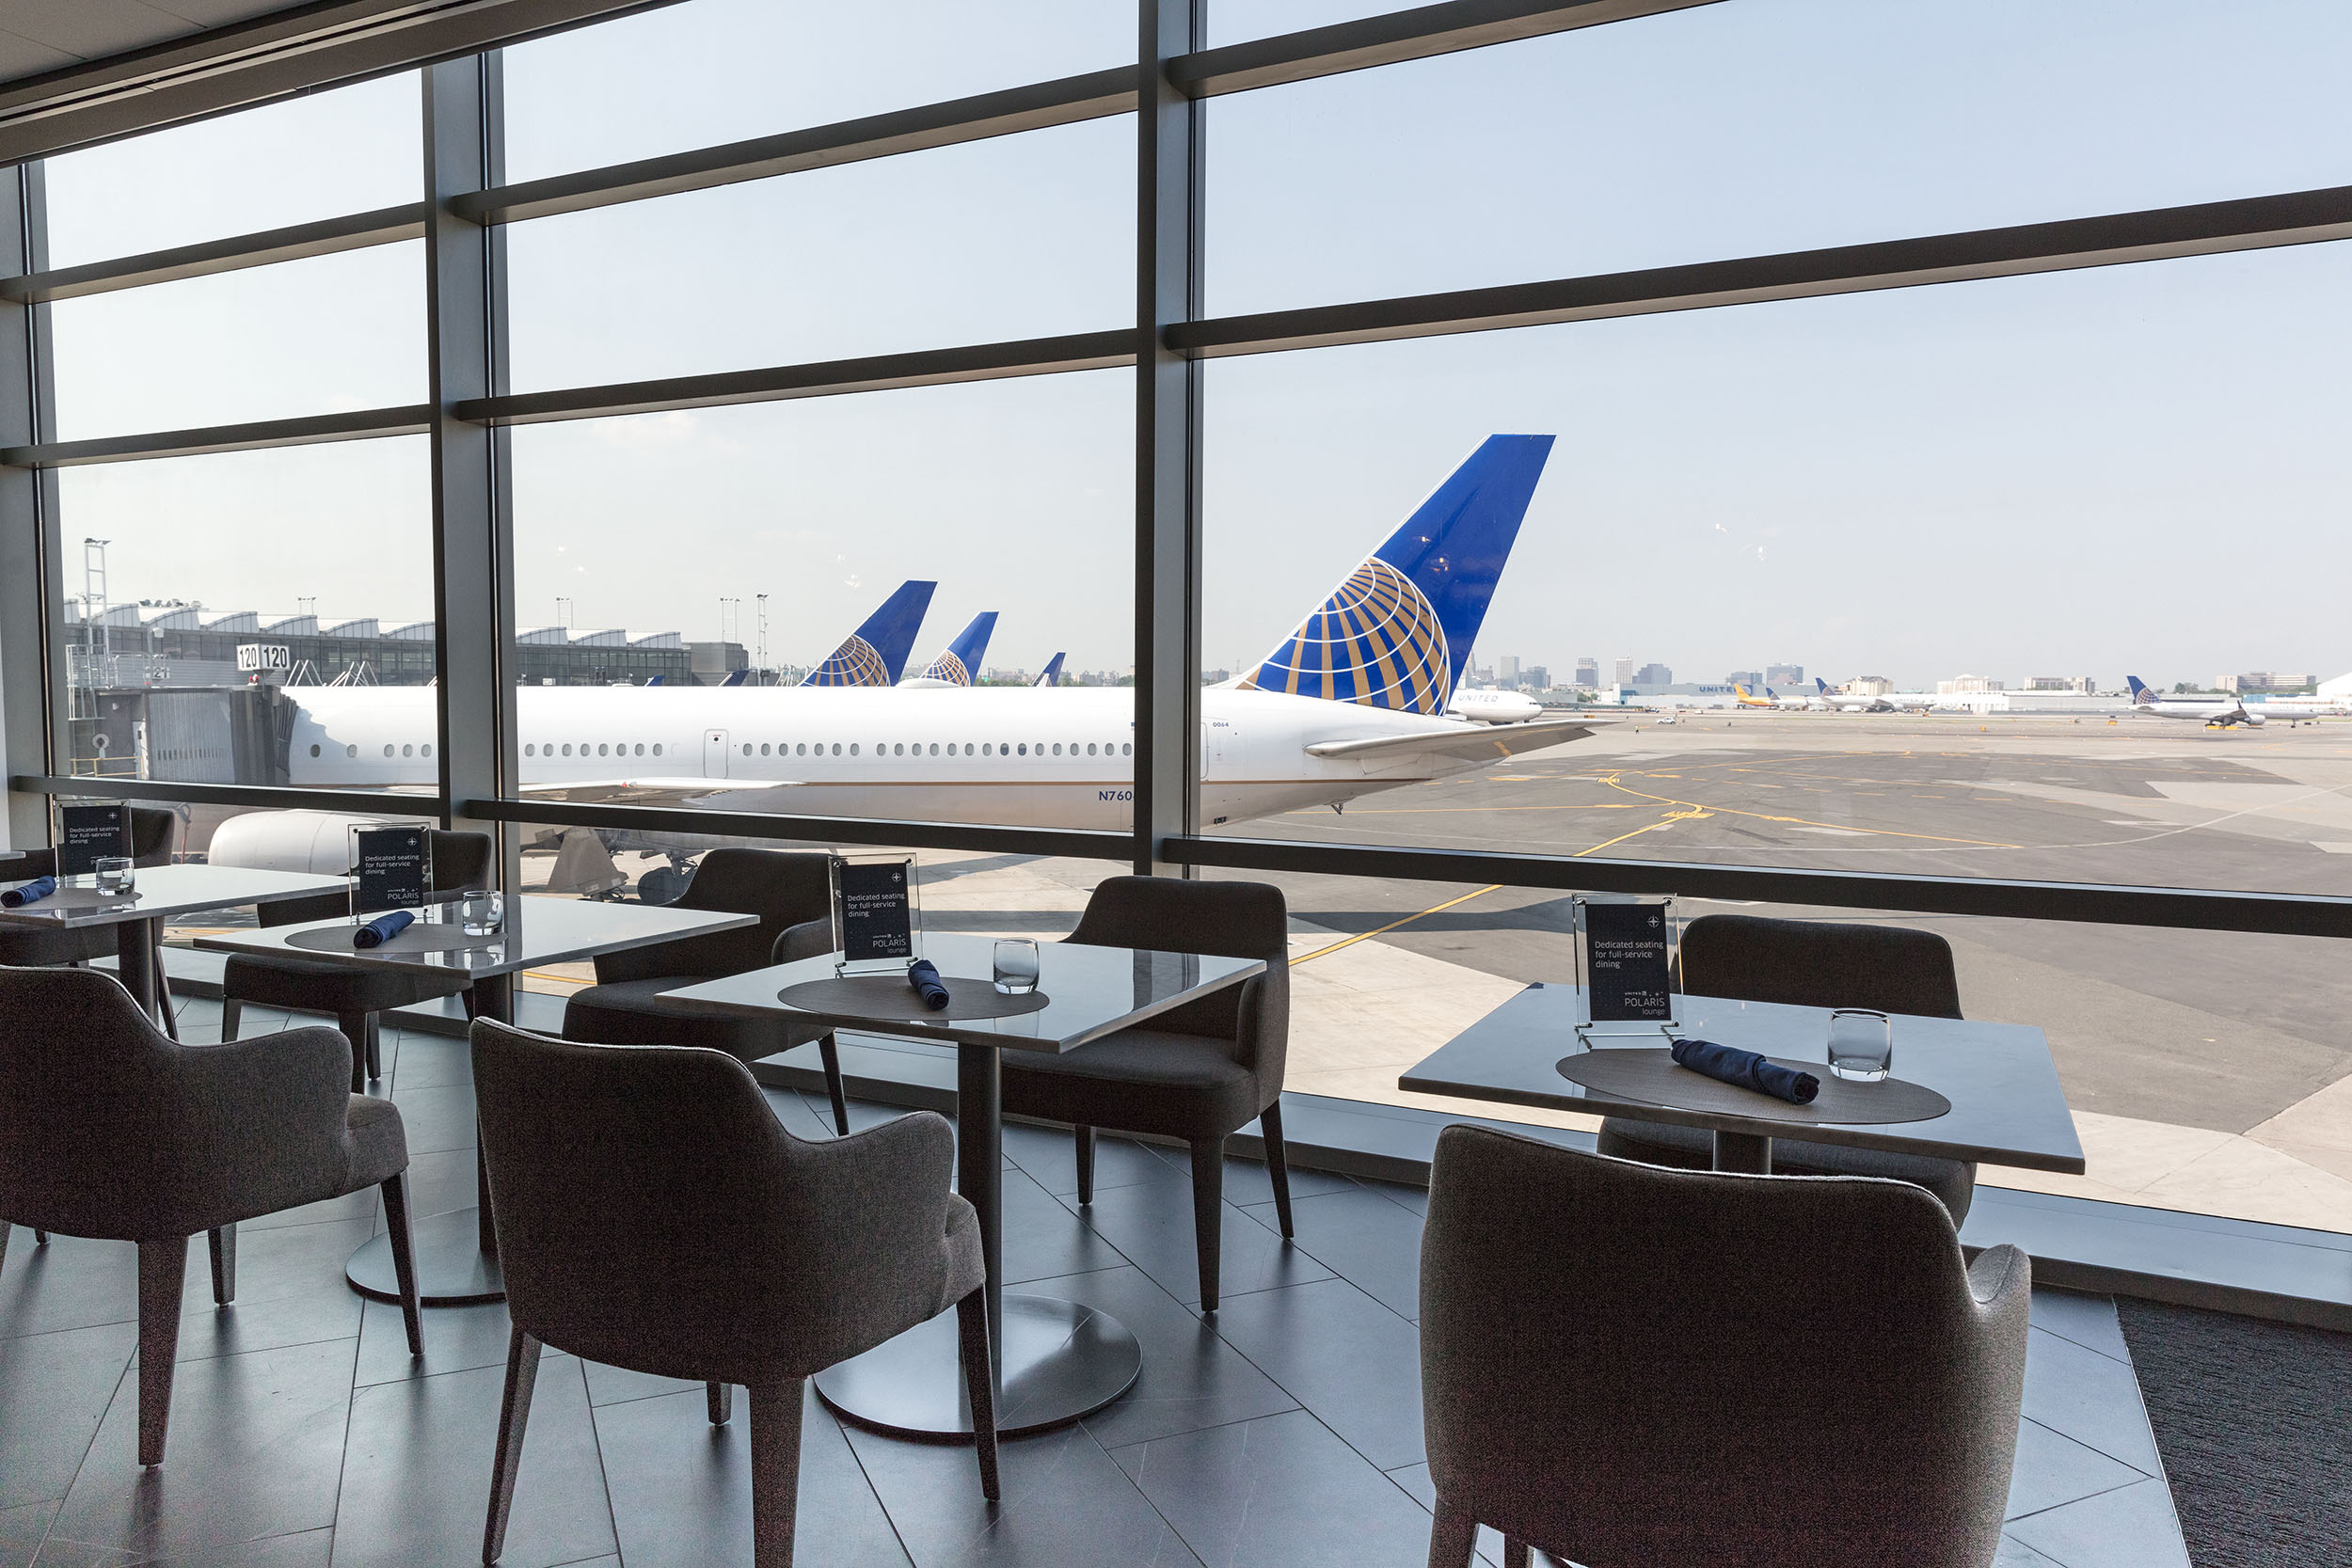 United Polaris lounge view at EWR